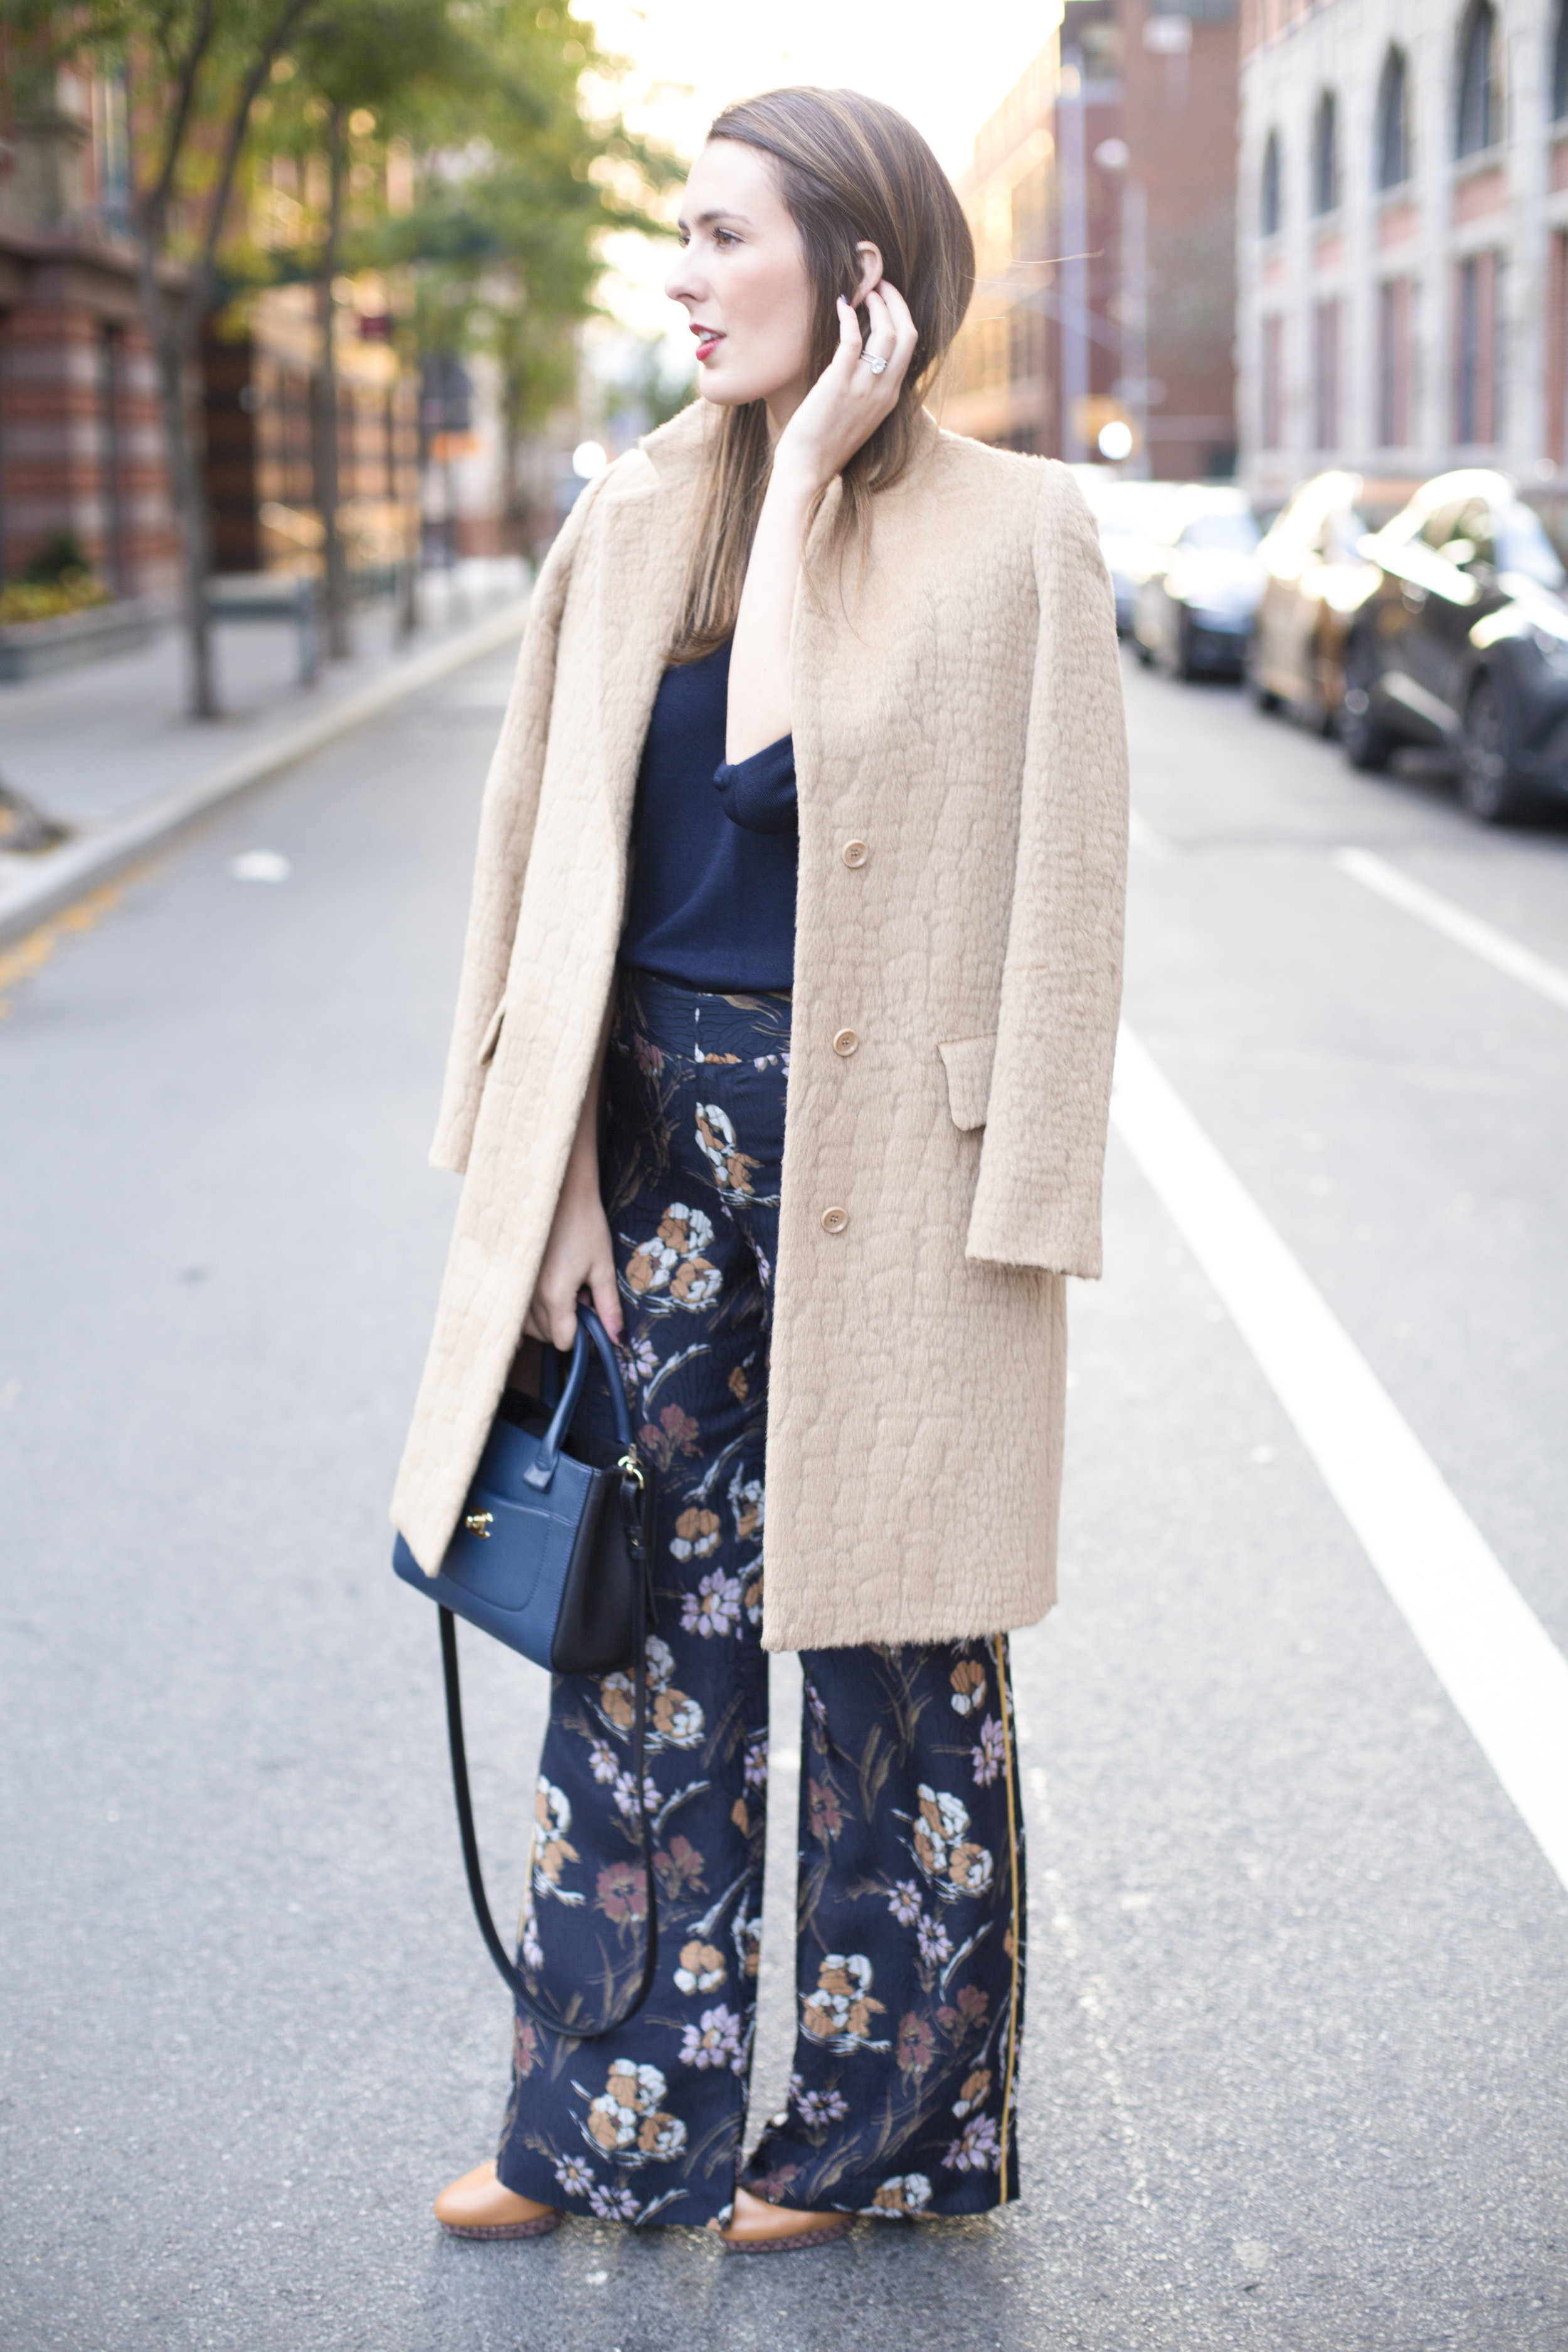 new york city freelance fashion photographer.JPG